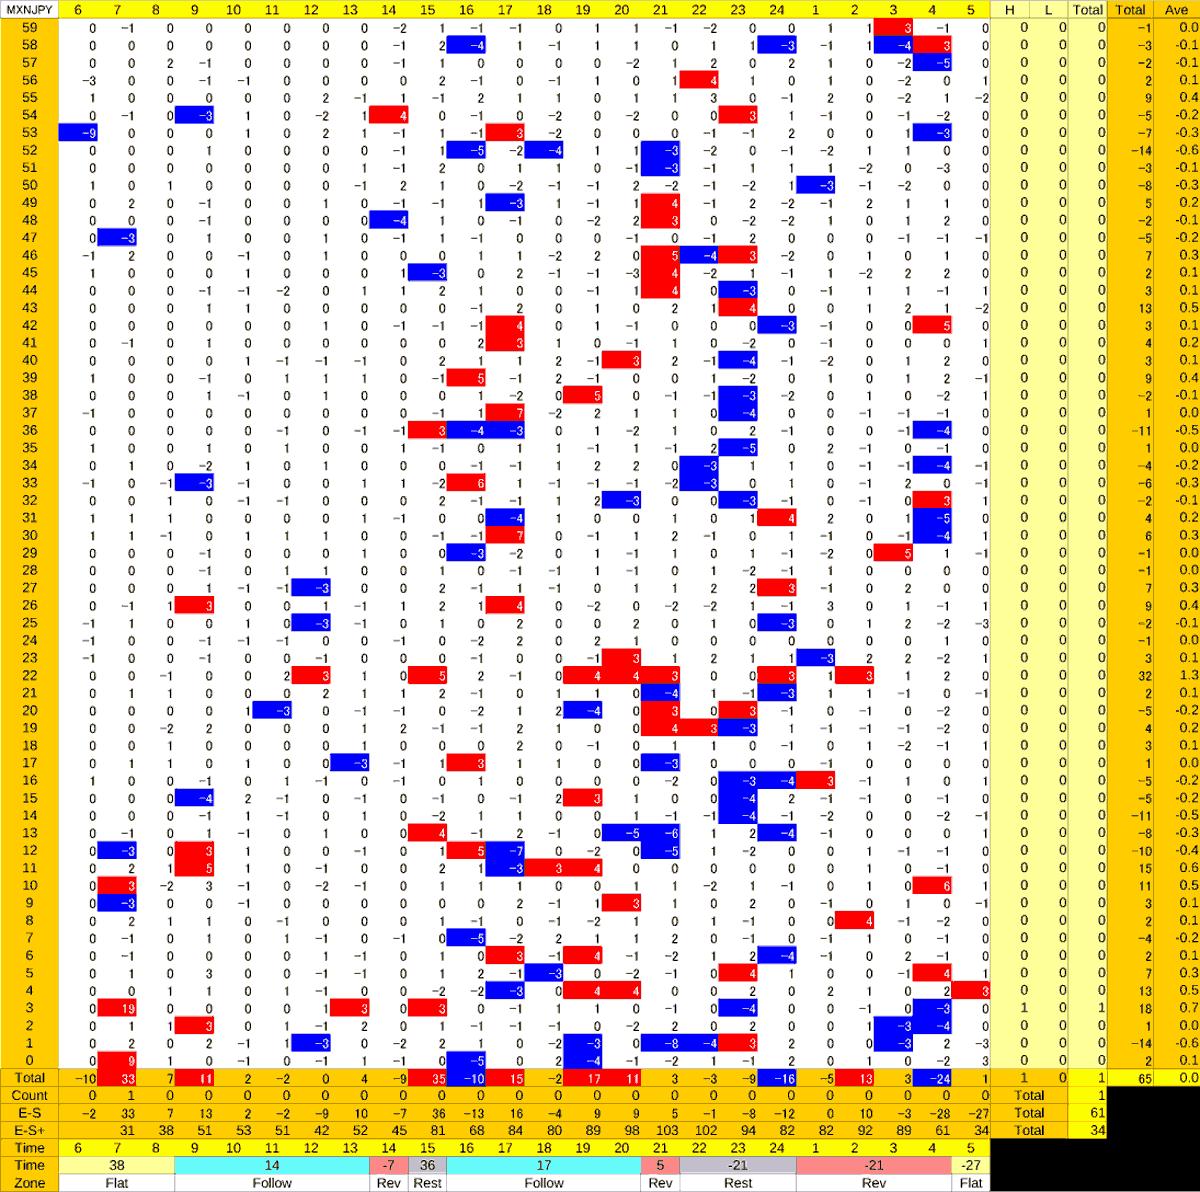 20200519_HS(3)MXNJPY